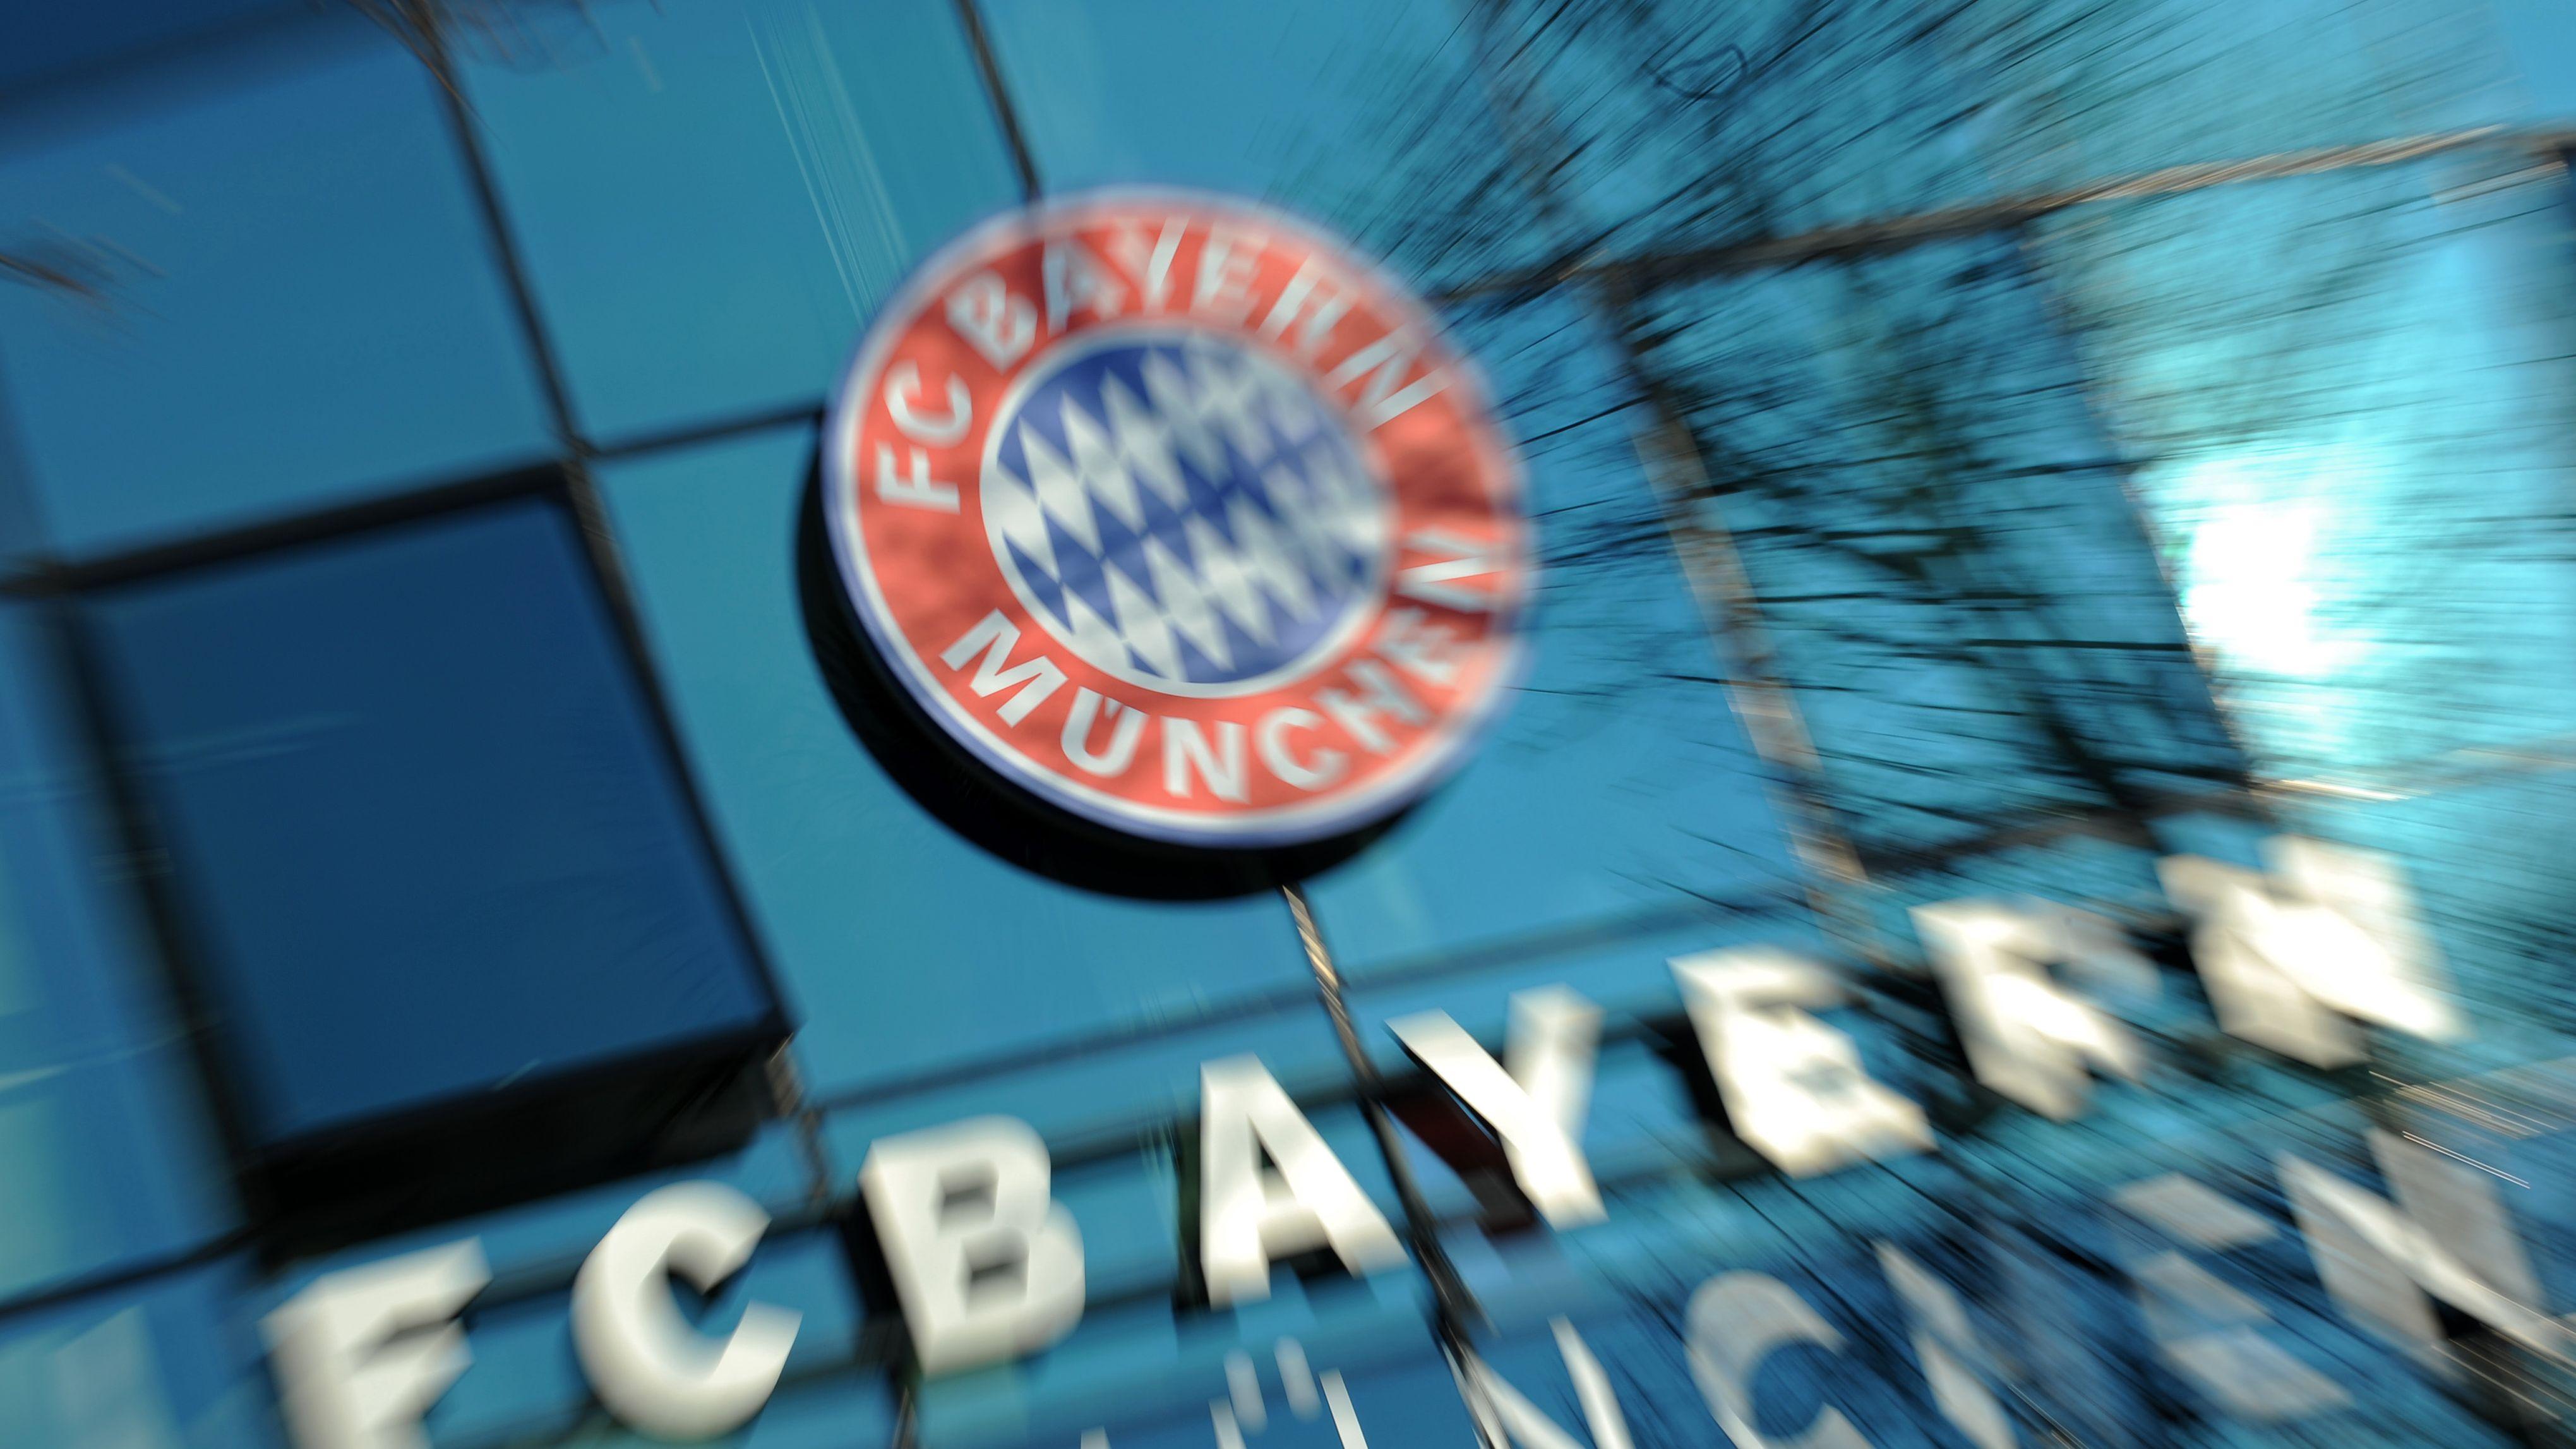 FC Bayern-Geschäftsstelle